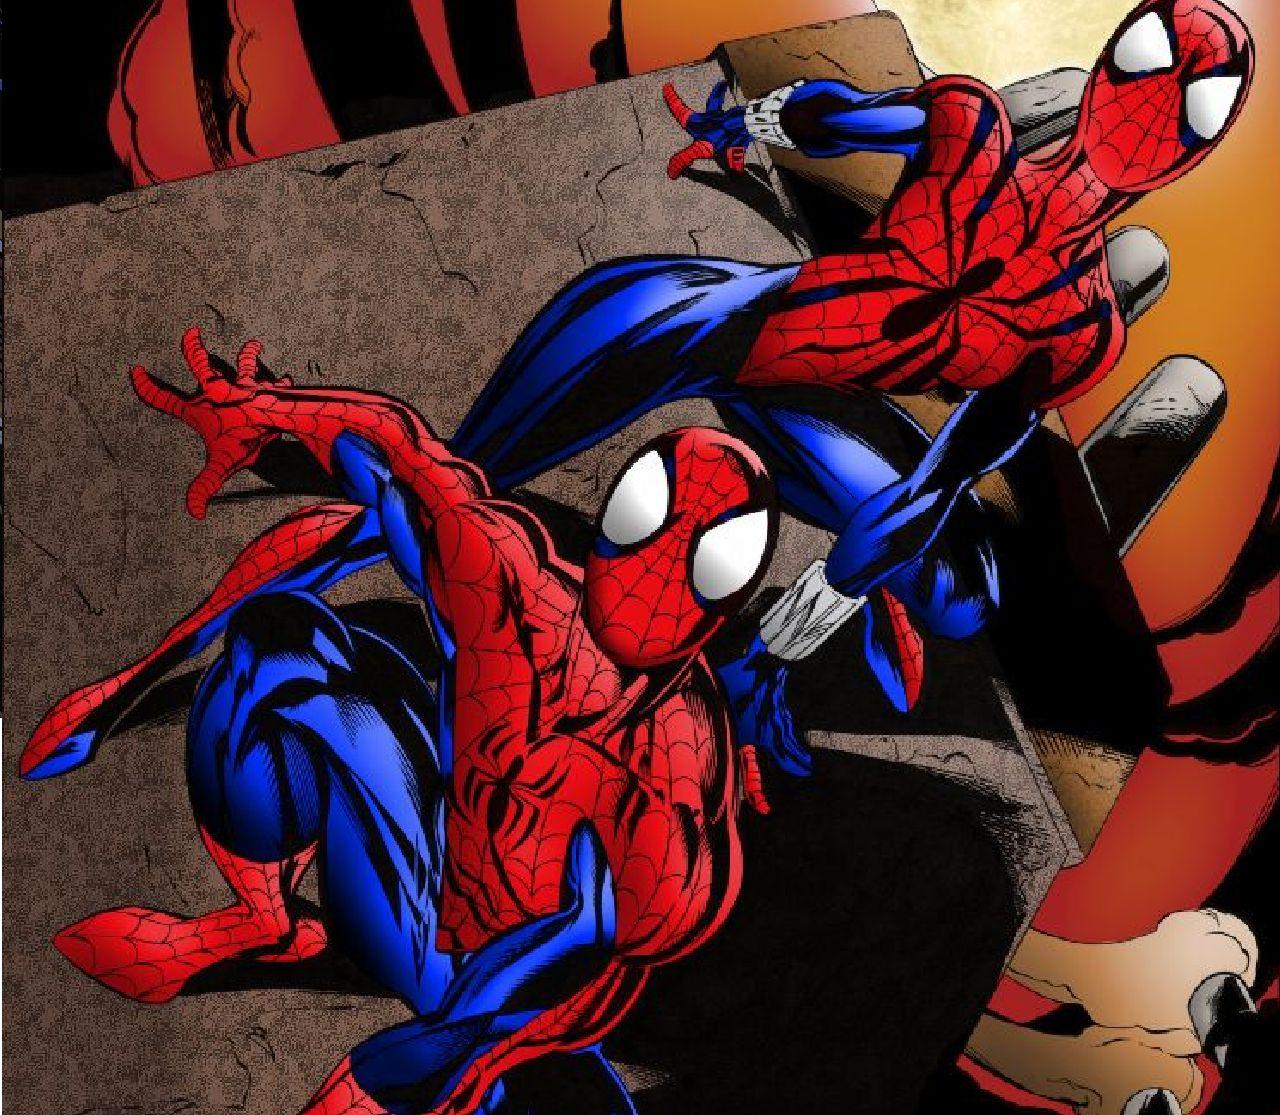 spiderman 3 2021 spider girl crossover